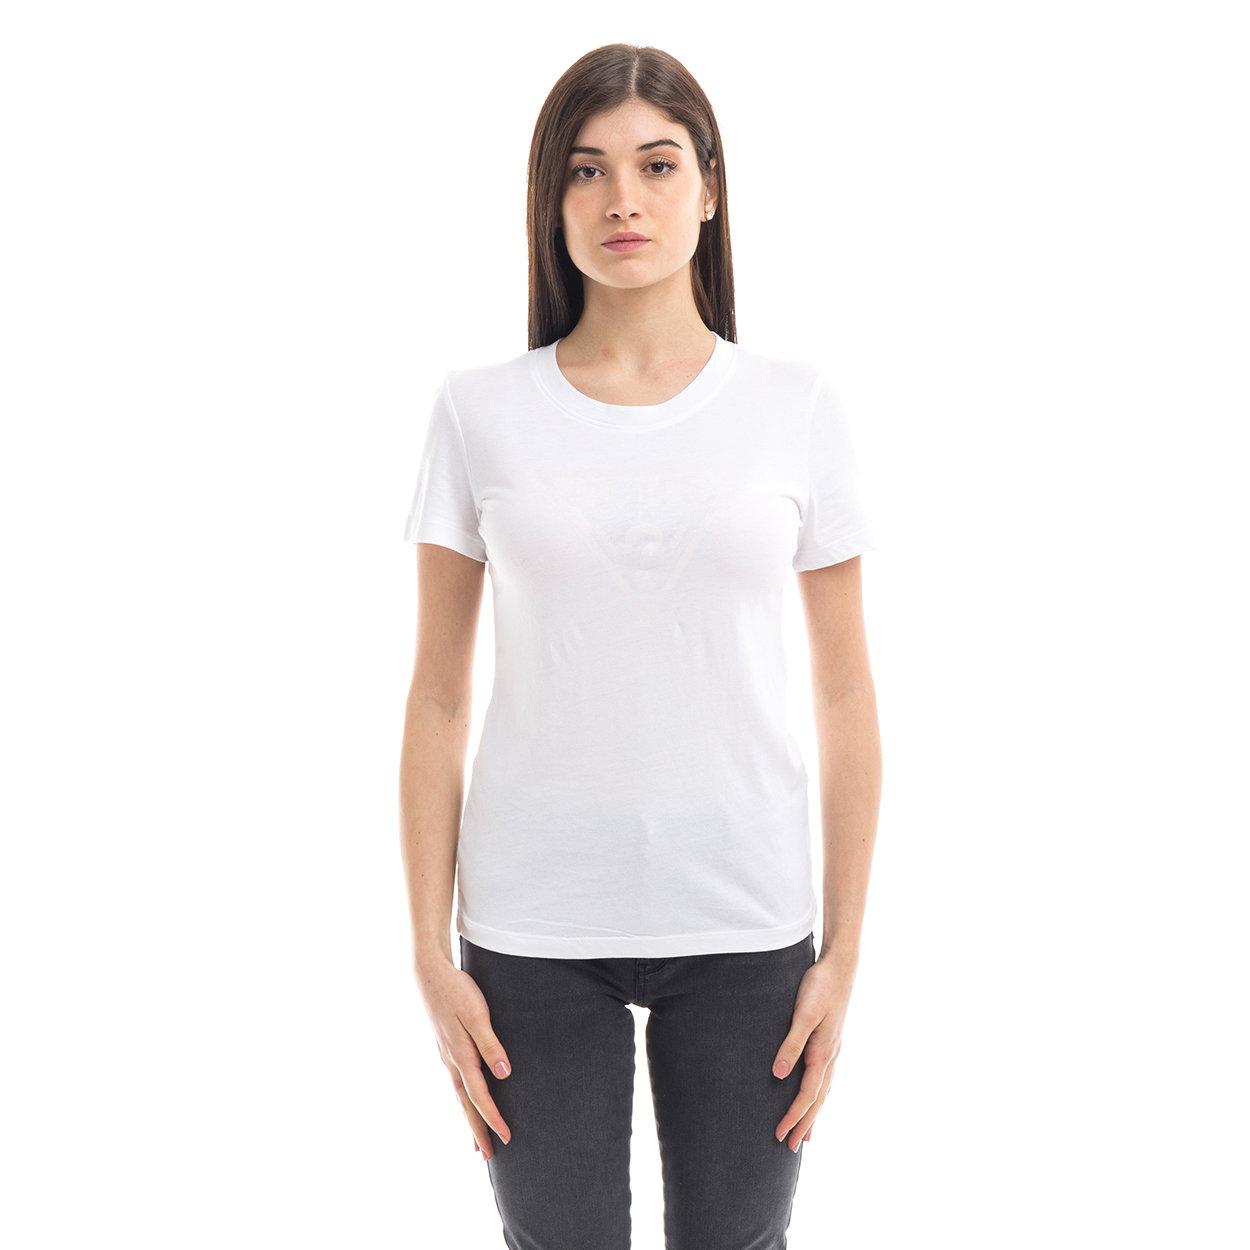 T shirt girocollo con logo bianca Guess Acquista su Ventis.